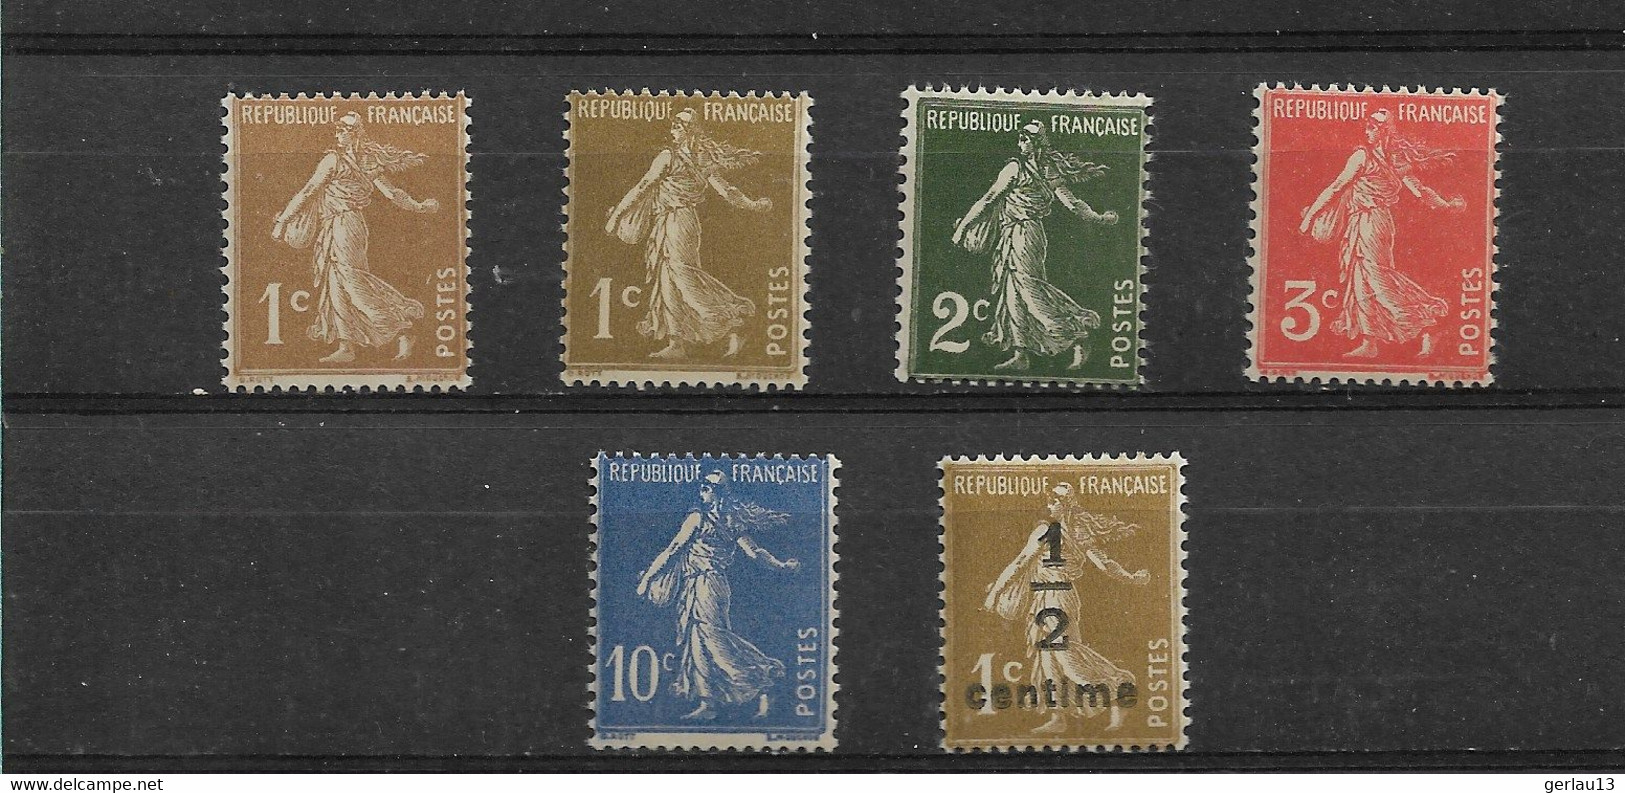 FRANCE   N° 277A/279A  **     NEUFS SANS CHARNIERE    MANQUE  278A  ET  279B - 1906-38 Semeuse Camée